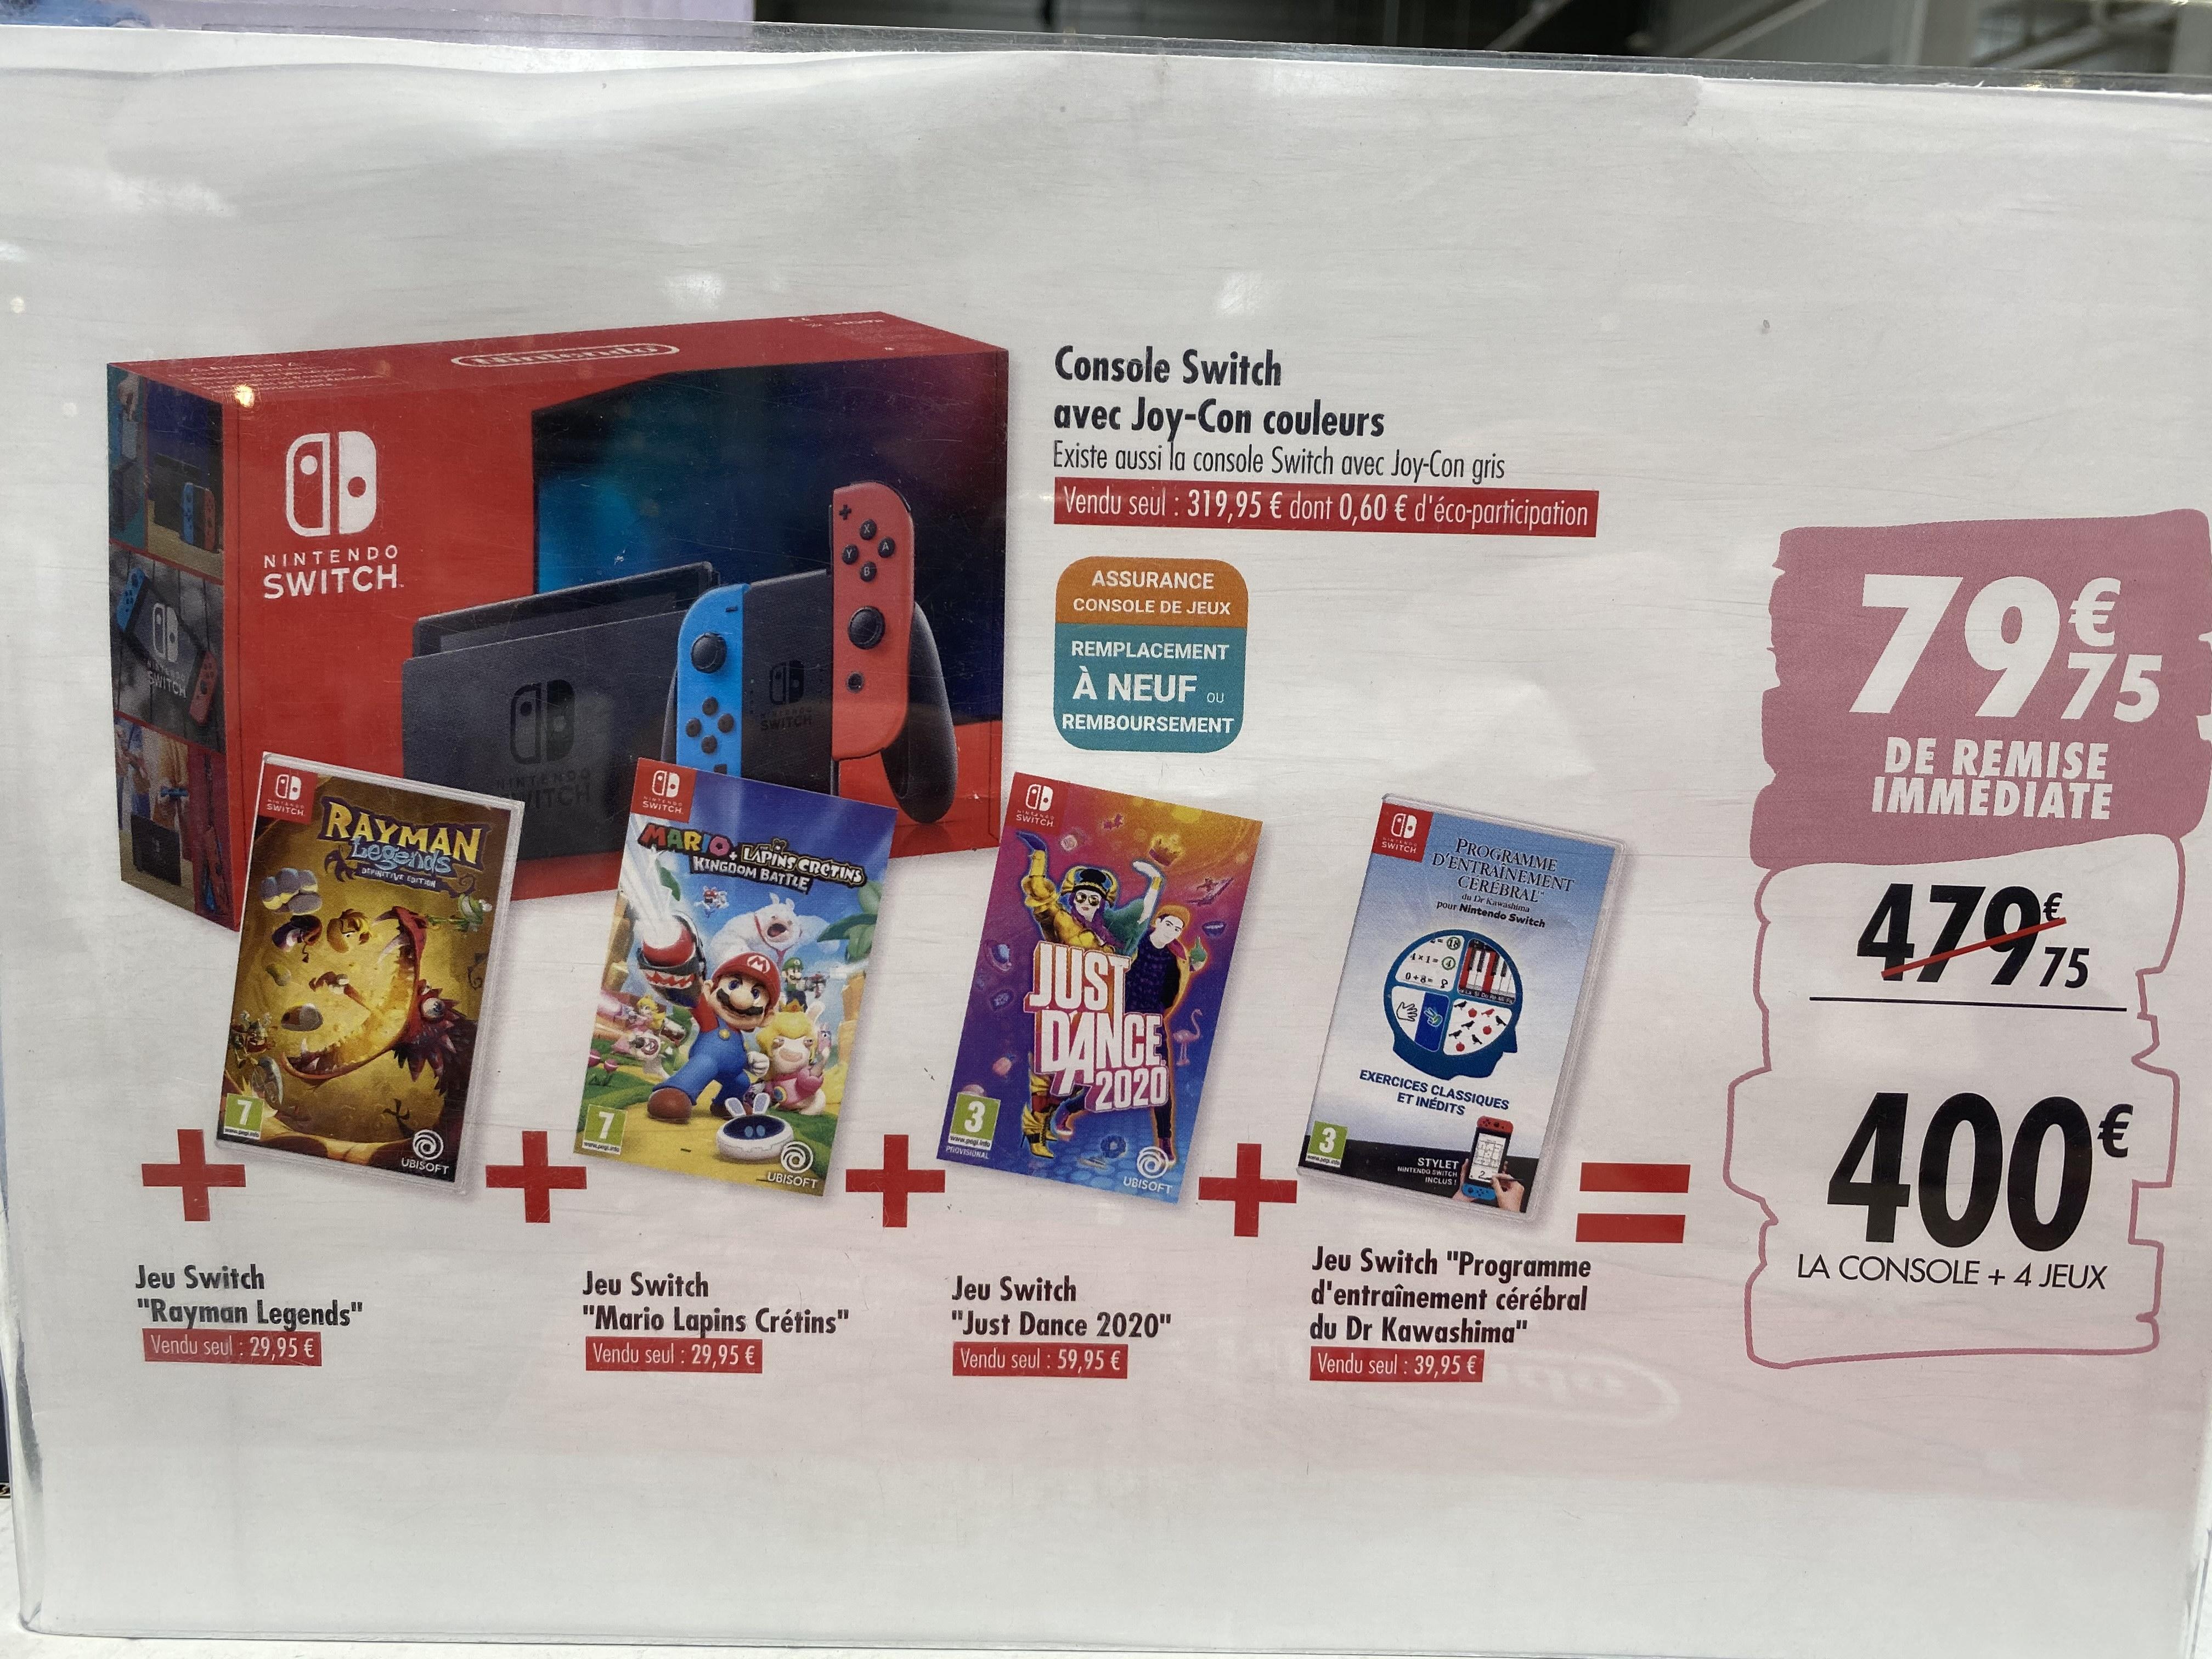 Pack Console Nintendo Switch + 4 jeux - Purpan (31)